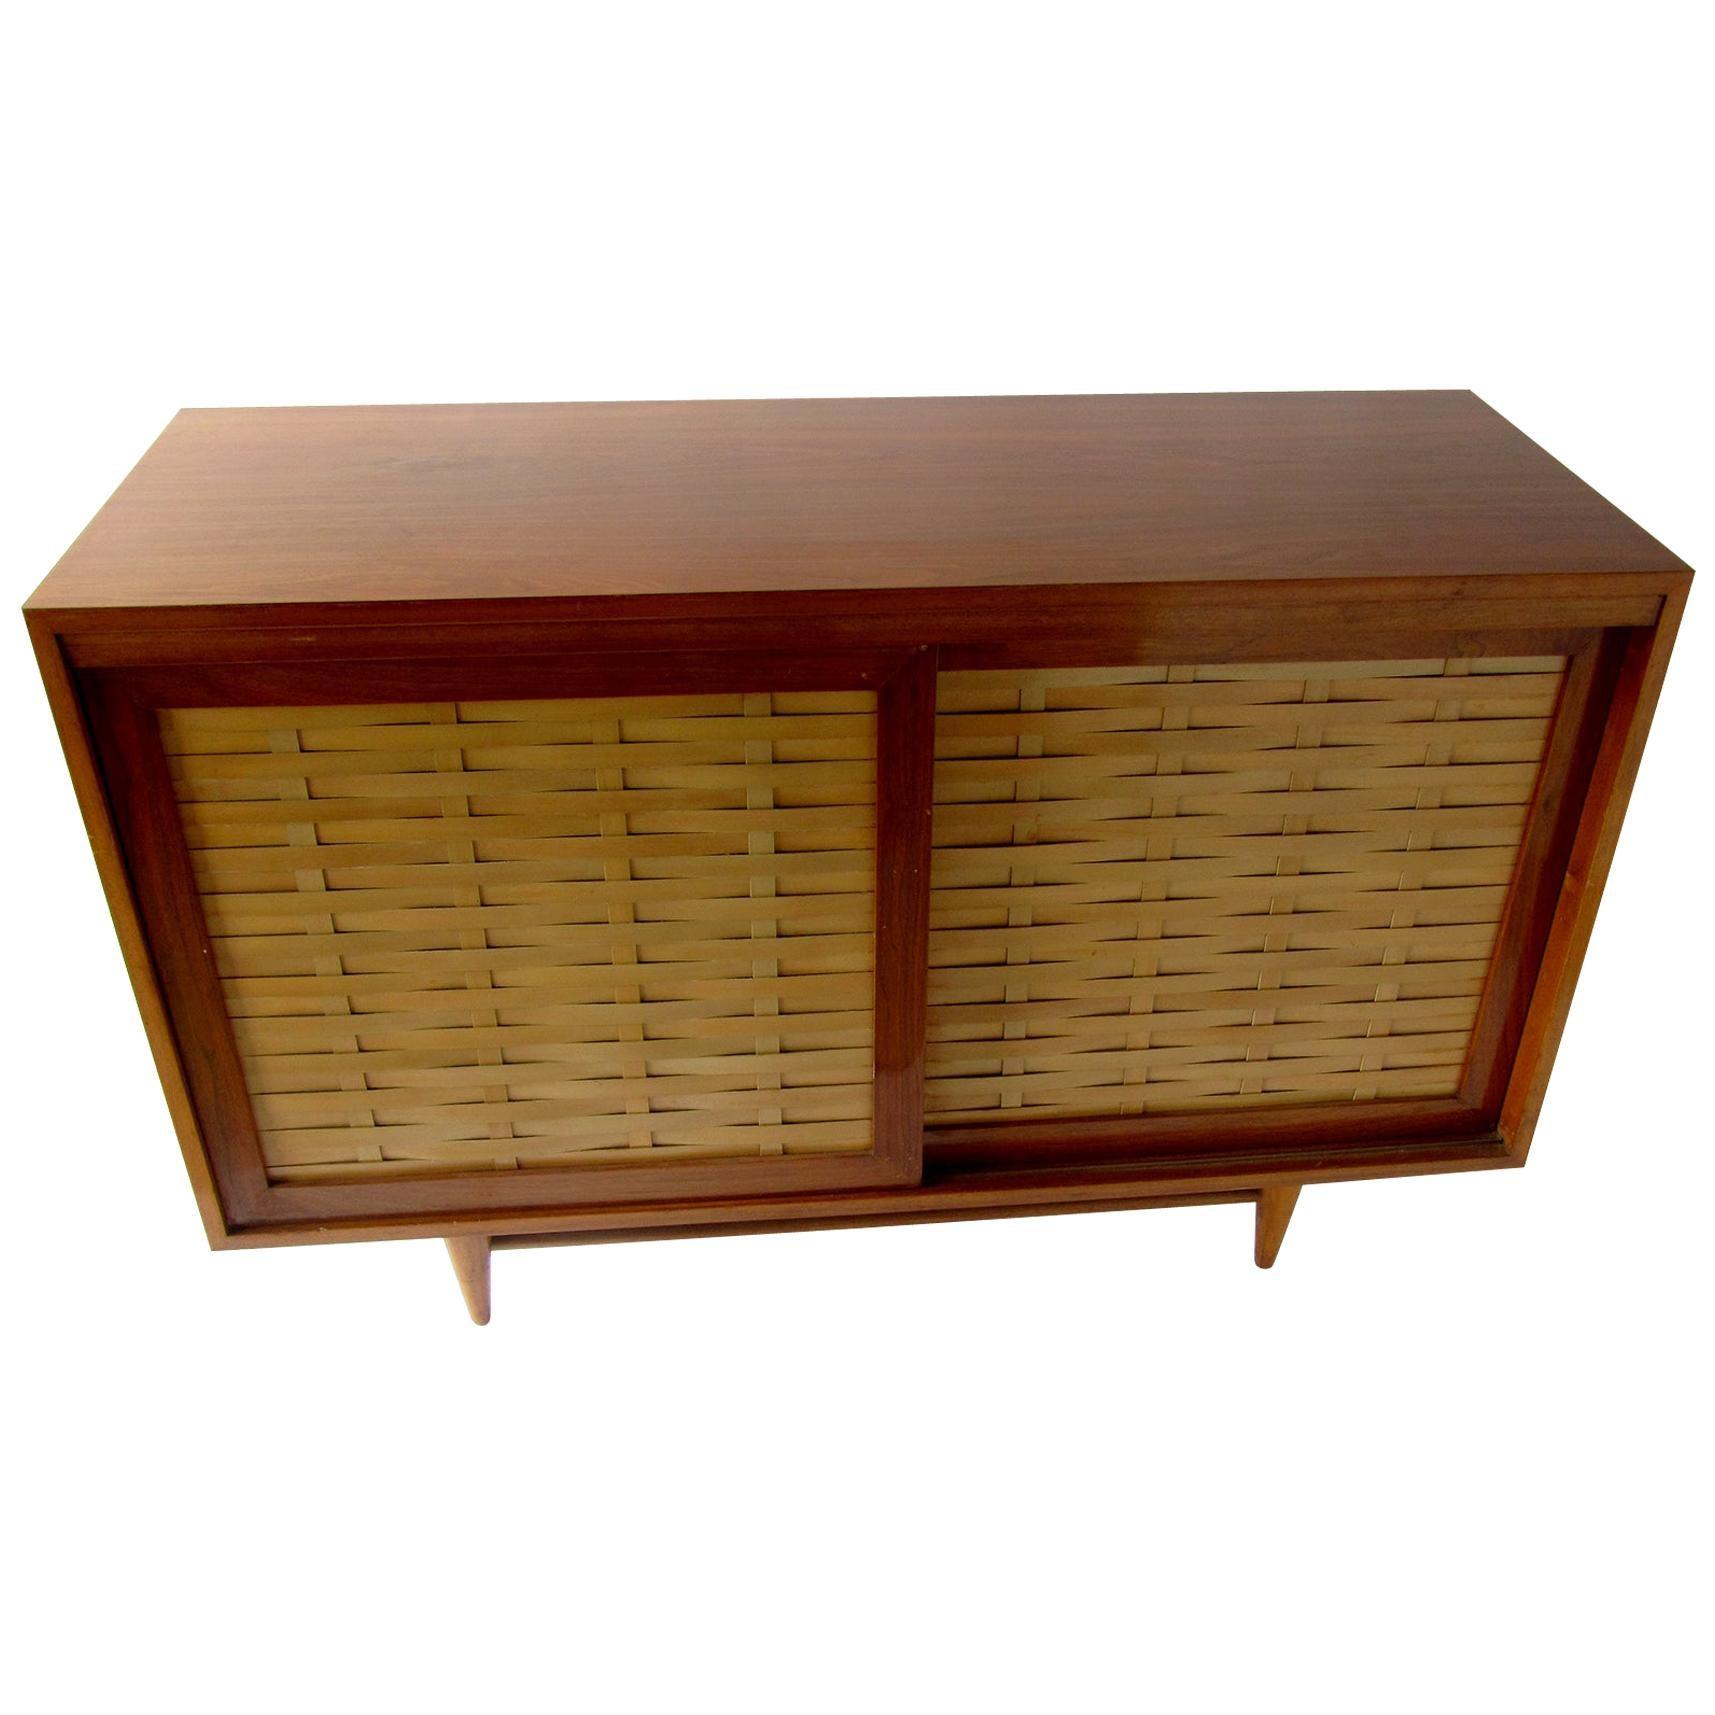 "American Modern Walnut and Birch 2-Door ""Woven Front"" Cabinet, Dunbar"